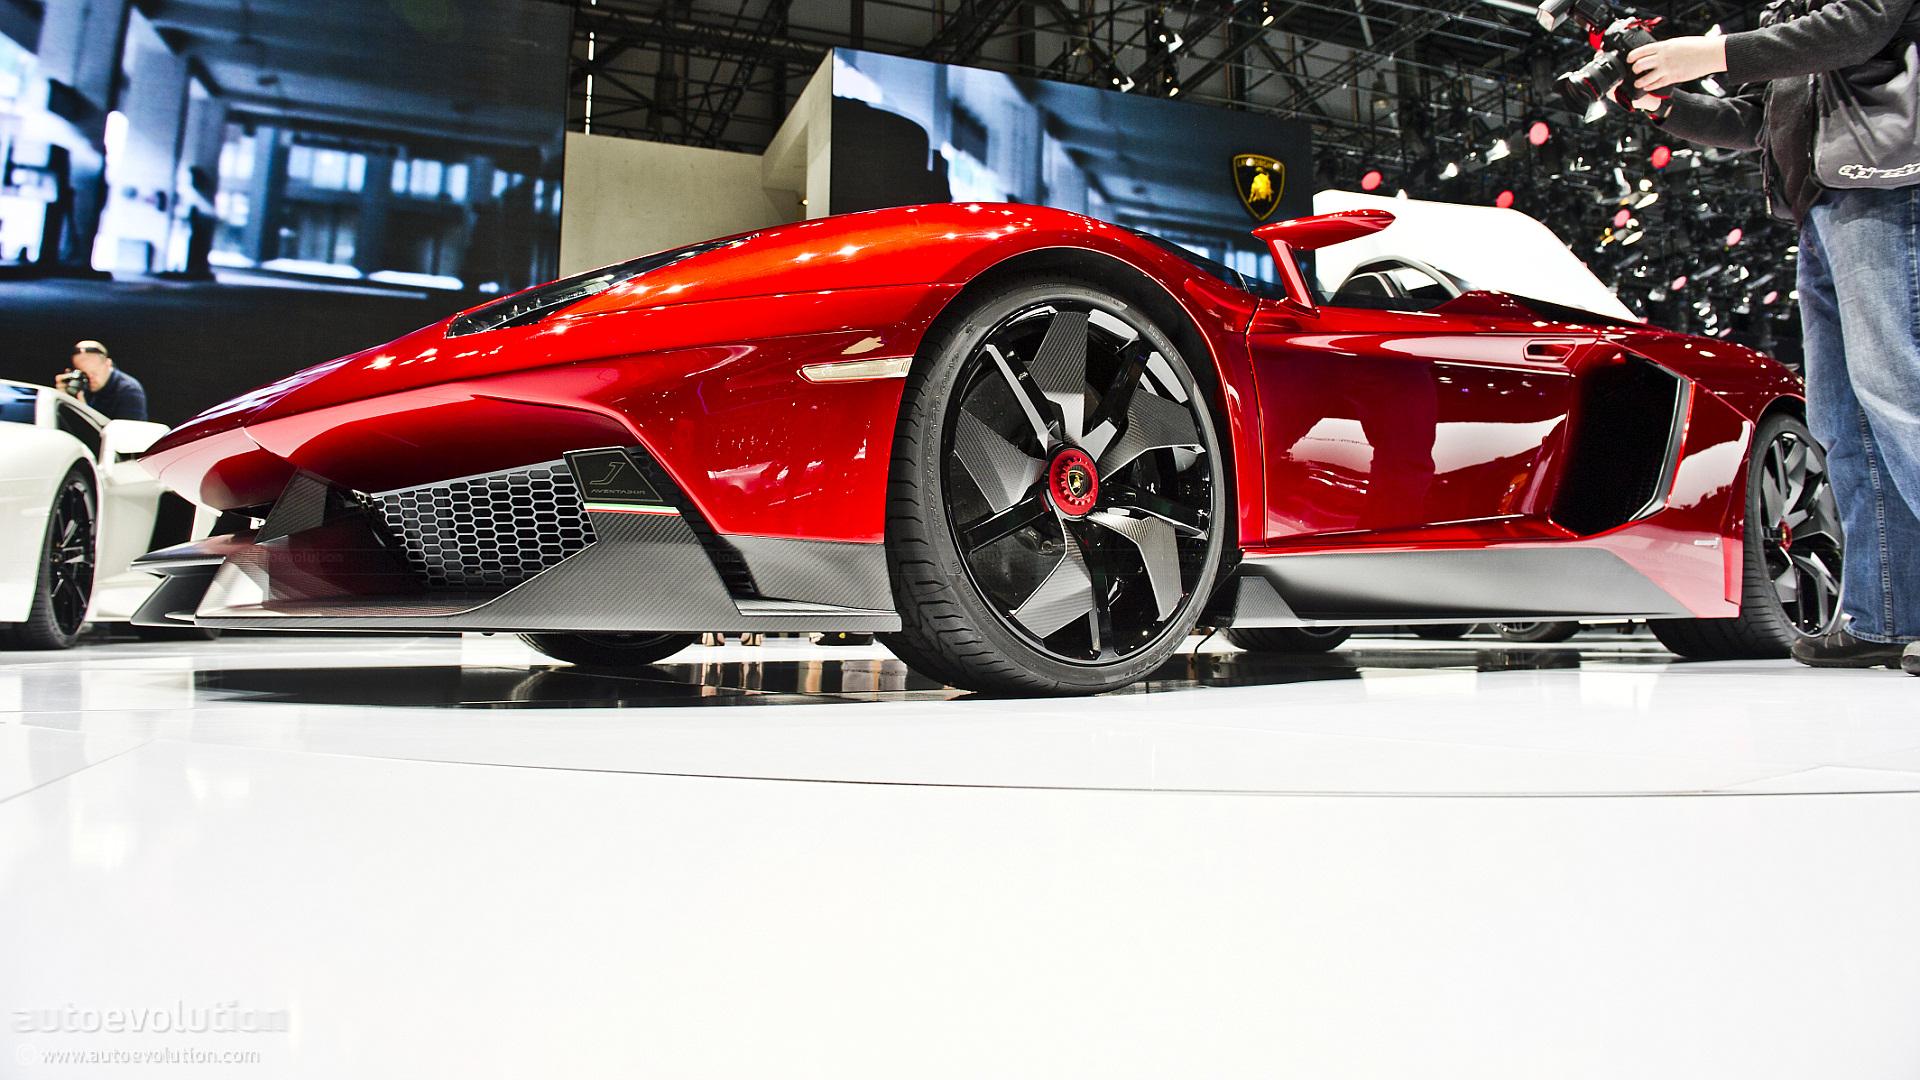 Lamborghini Aventador J HD Wallpaper